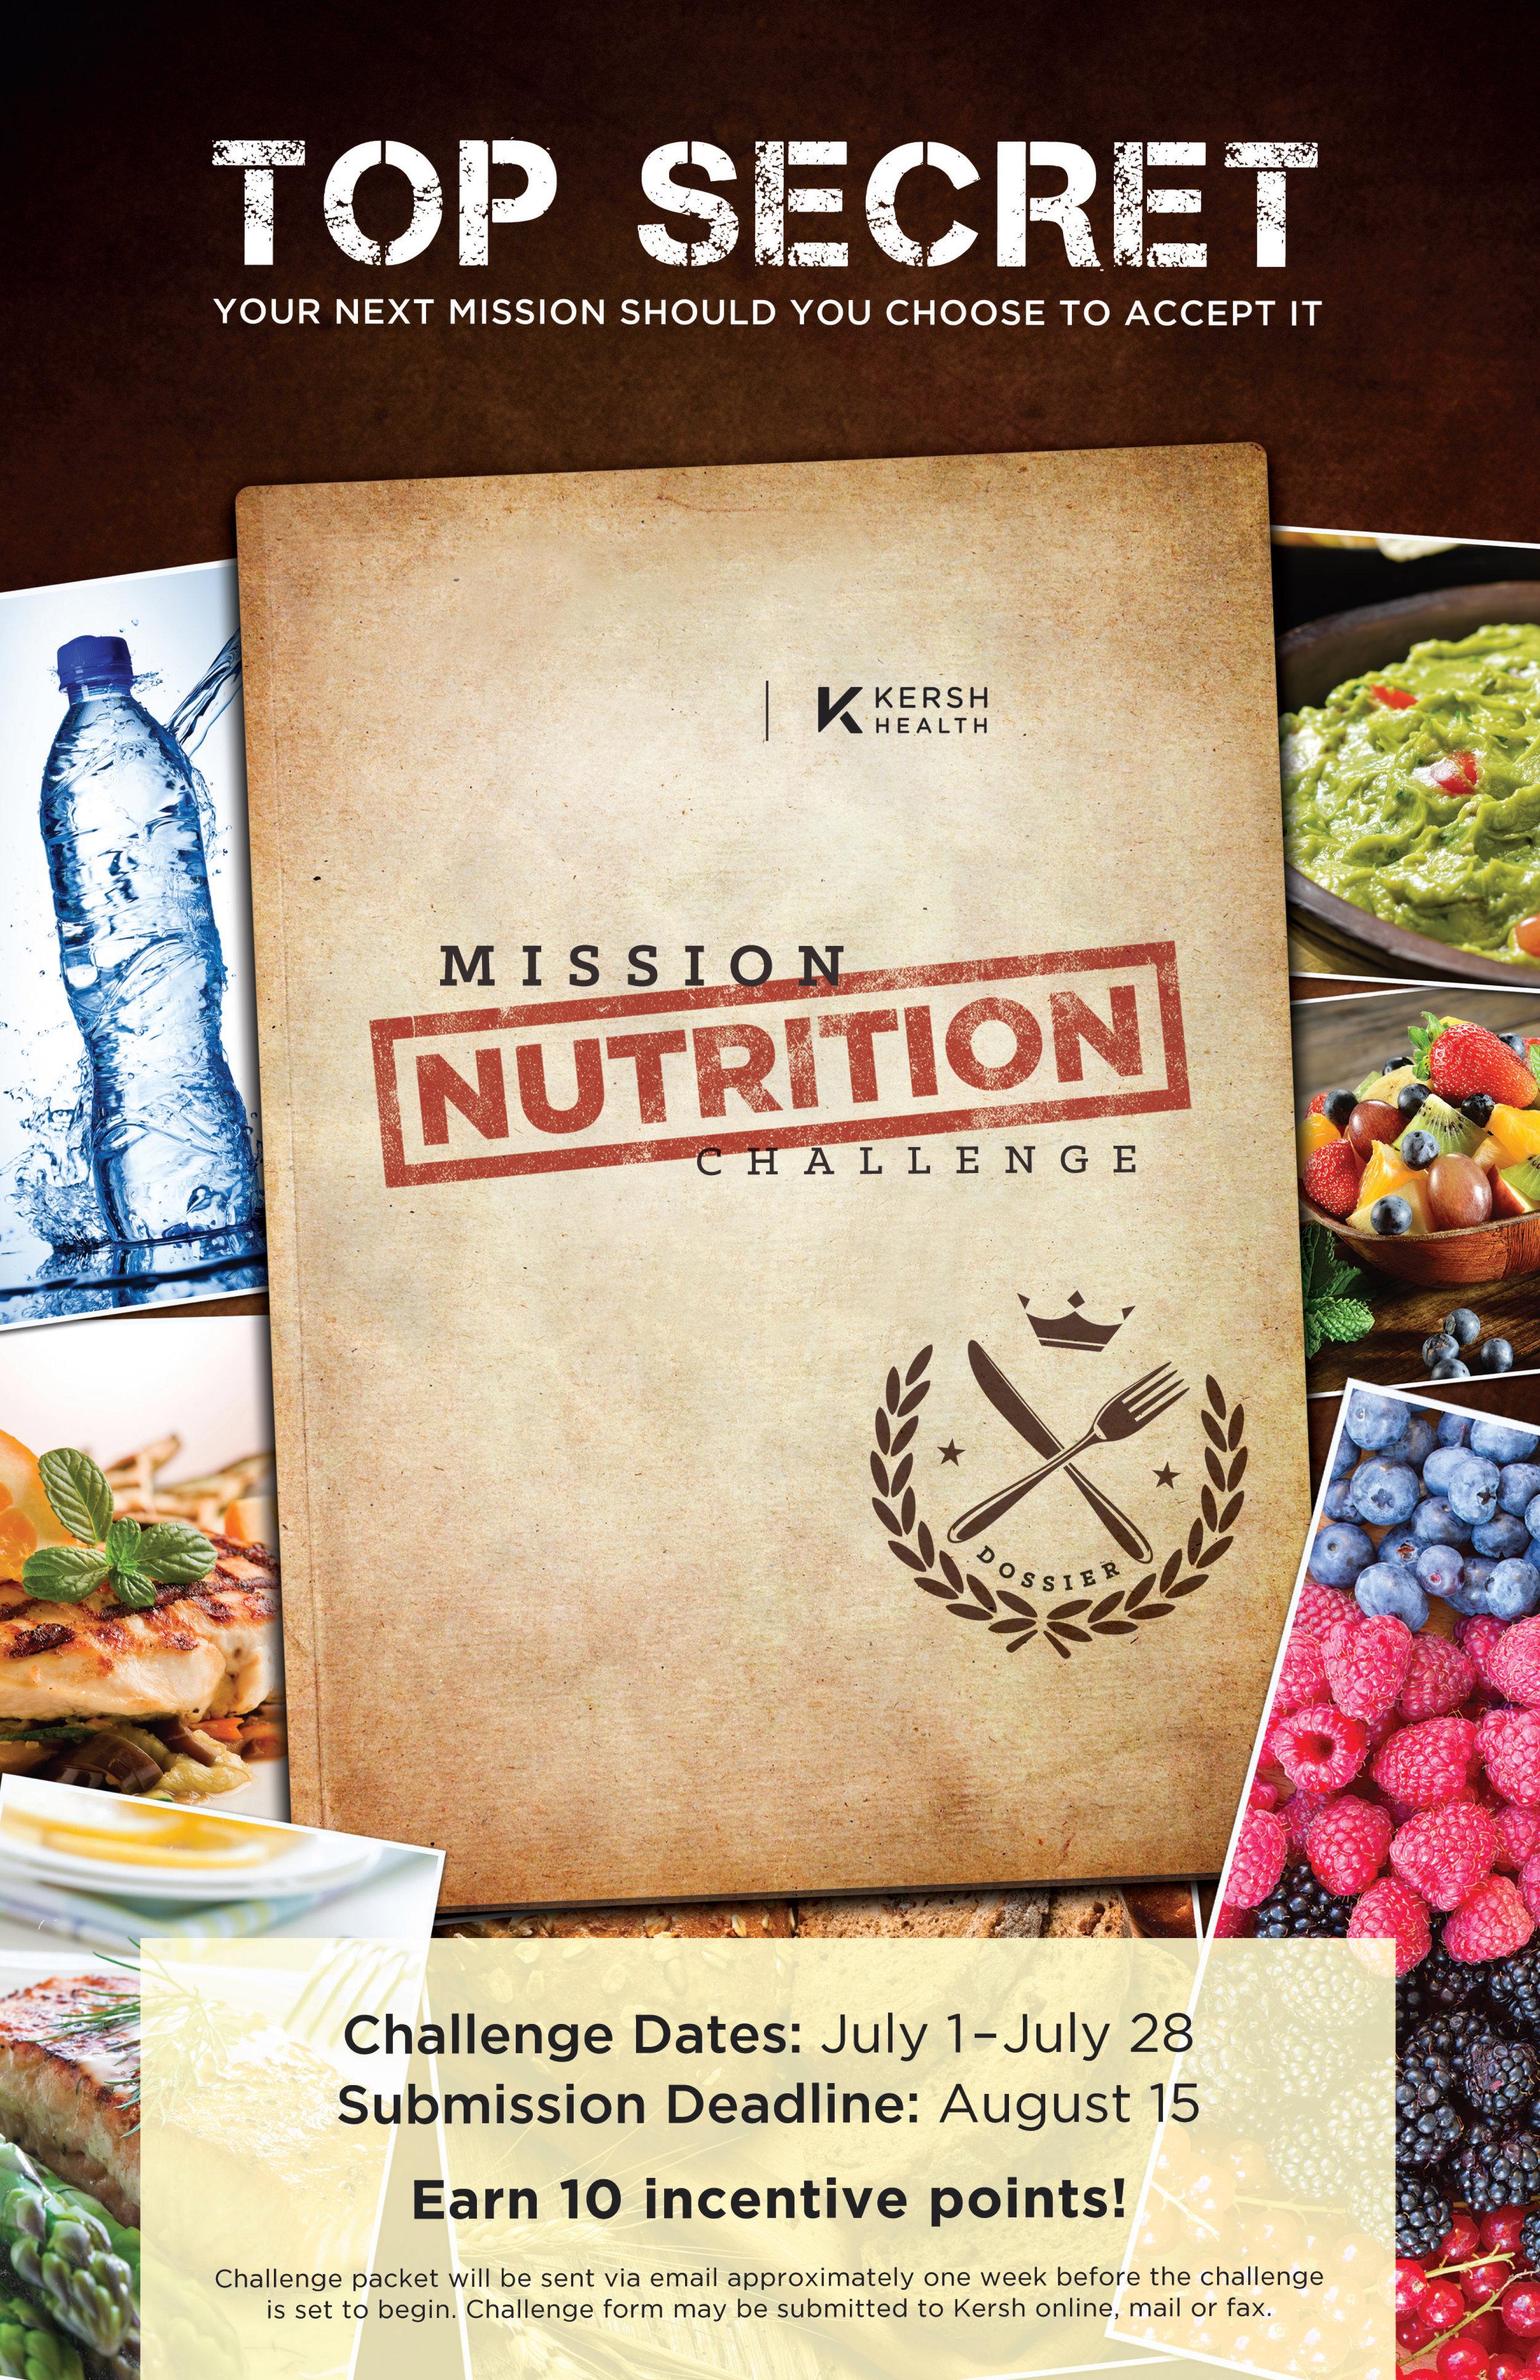 Mission Nutrition Poster.JPG